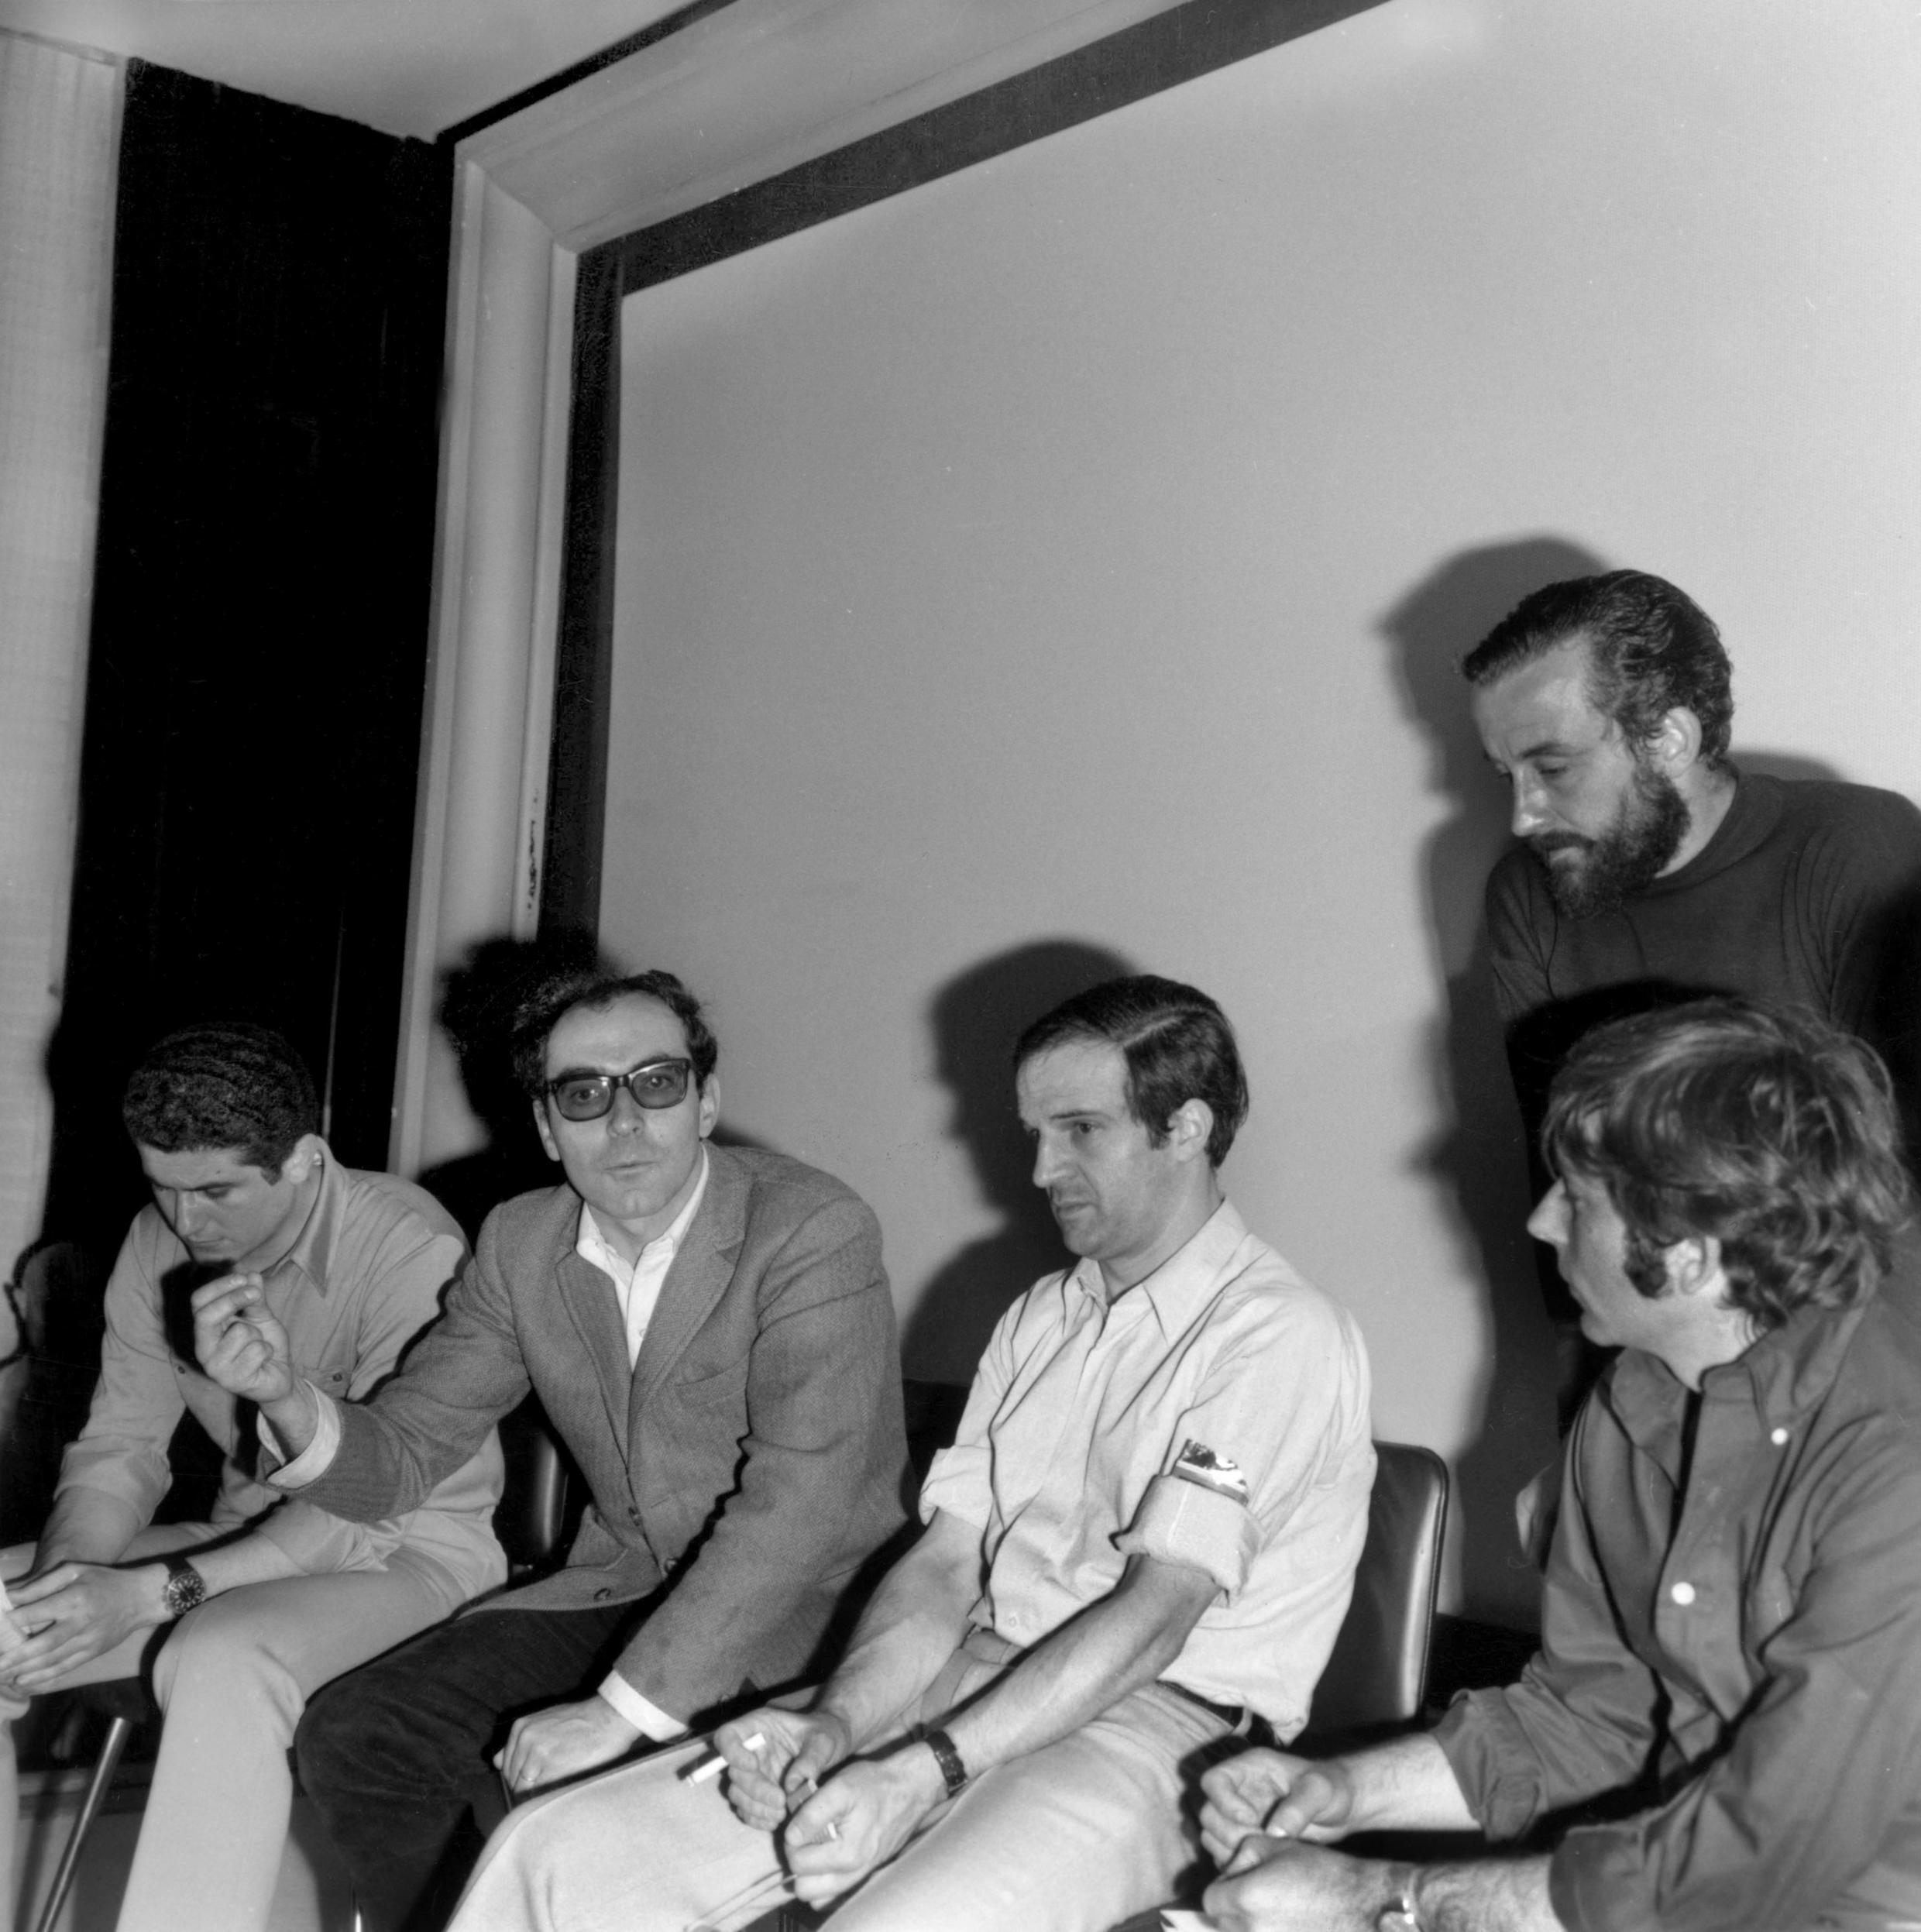 Directors On Strike<br>Directors Claude Lelouch, Jean-Luc Godard, Francois Truffaut, Roman Polanski and Louis Malle (standing) on strike during the Cannes Film Festival 1968